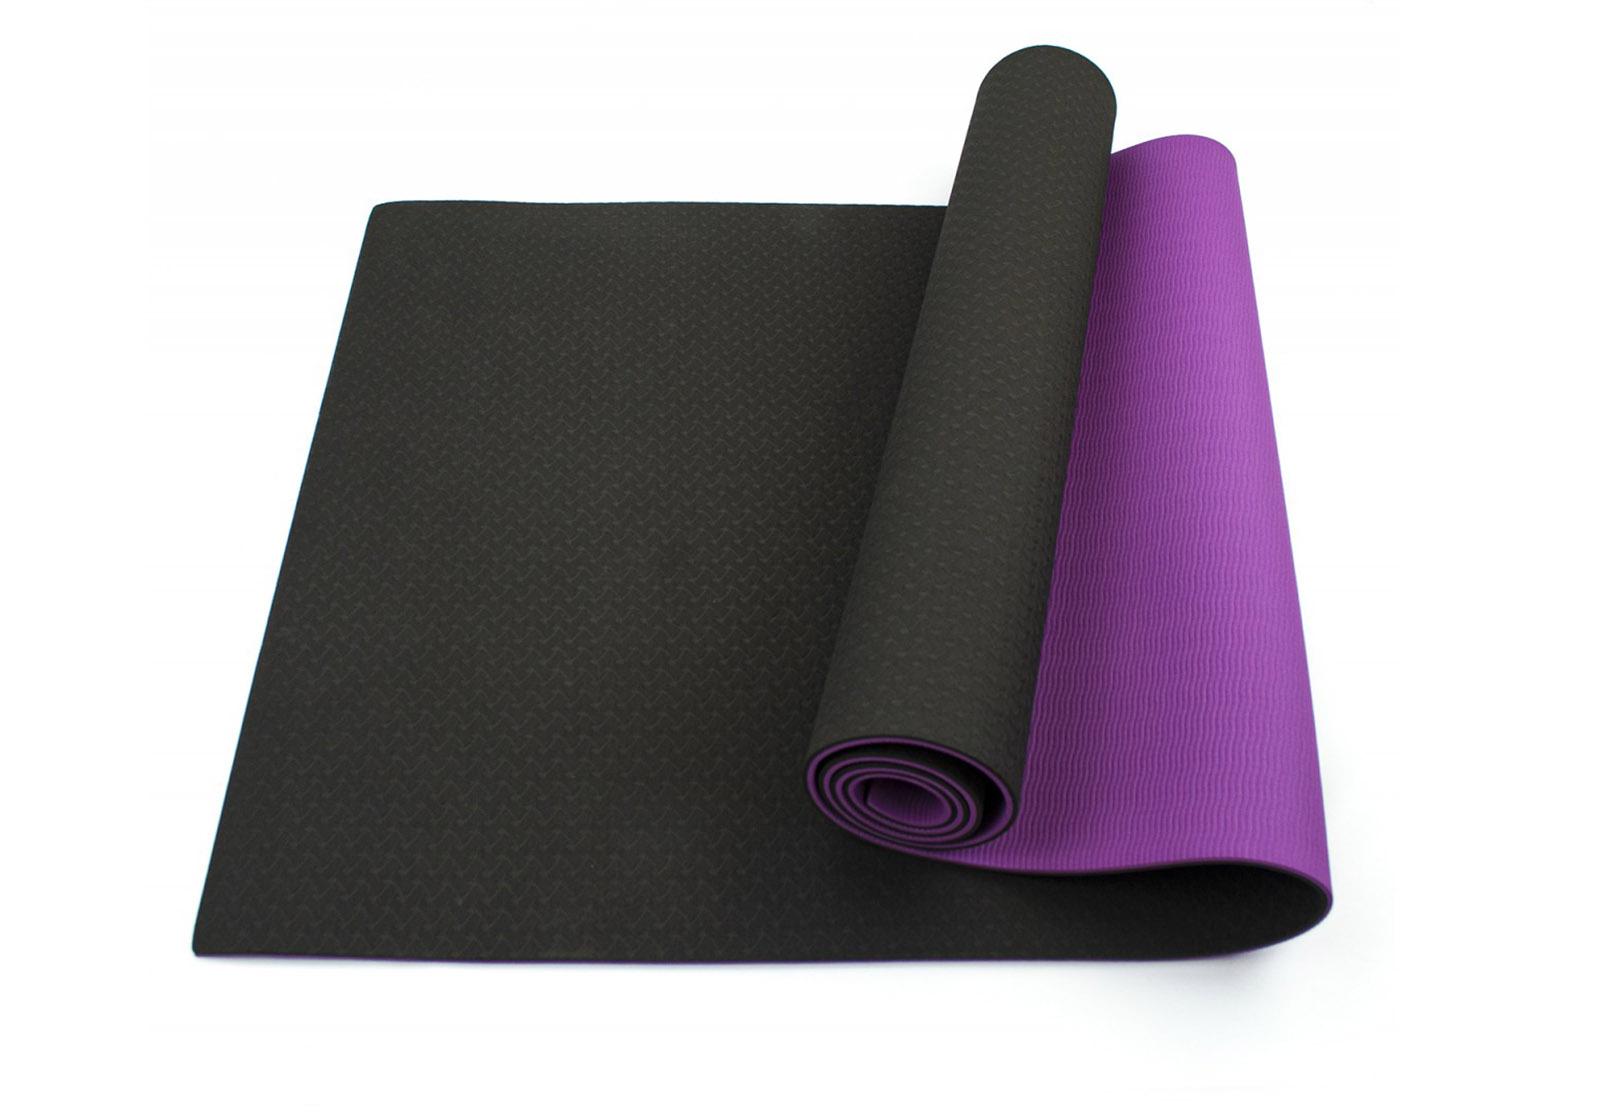 kovrik-dlya-jogi-i-fitnesa-hanuman-two-tones-amber-black-violet